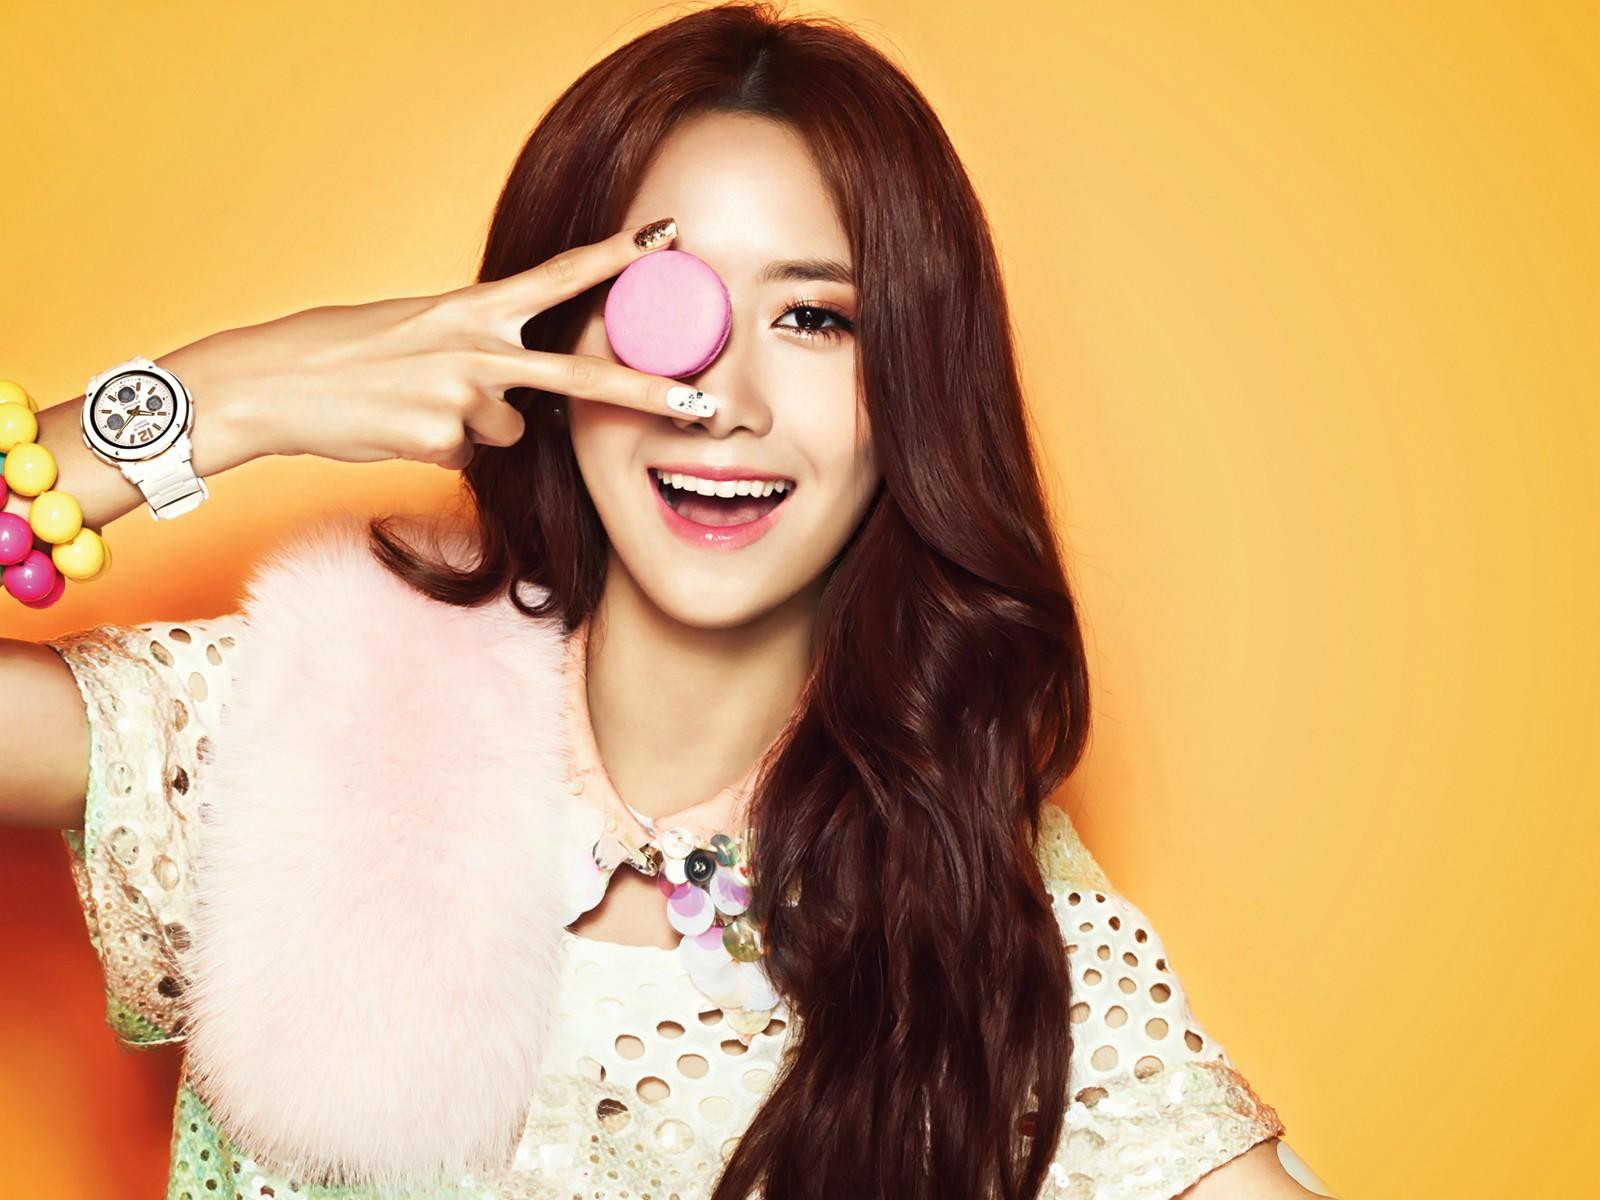 http://1.bp.blogspot.com/-Ldghn2MsjCo/ULyS7WRw14I/AAAAAAAAROA/D0anI0J7naE/s1600/SNSD+Girls+Generation+Yoona+wallpaper.jpg